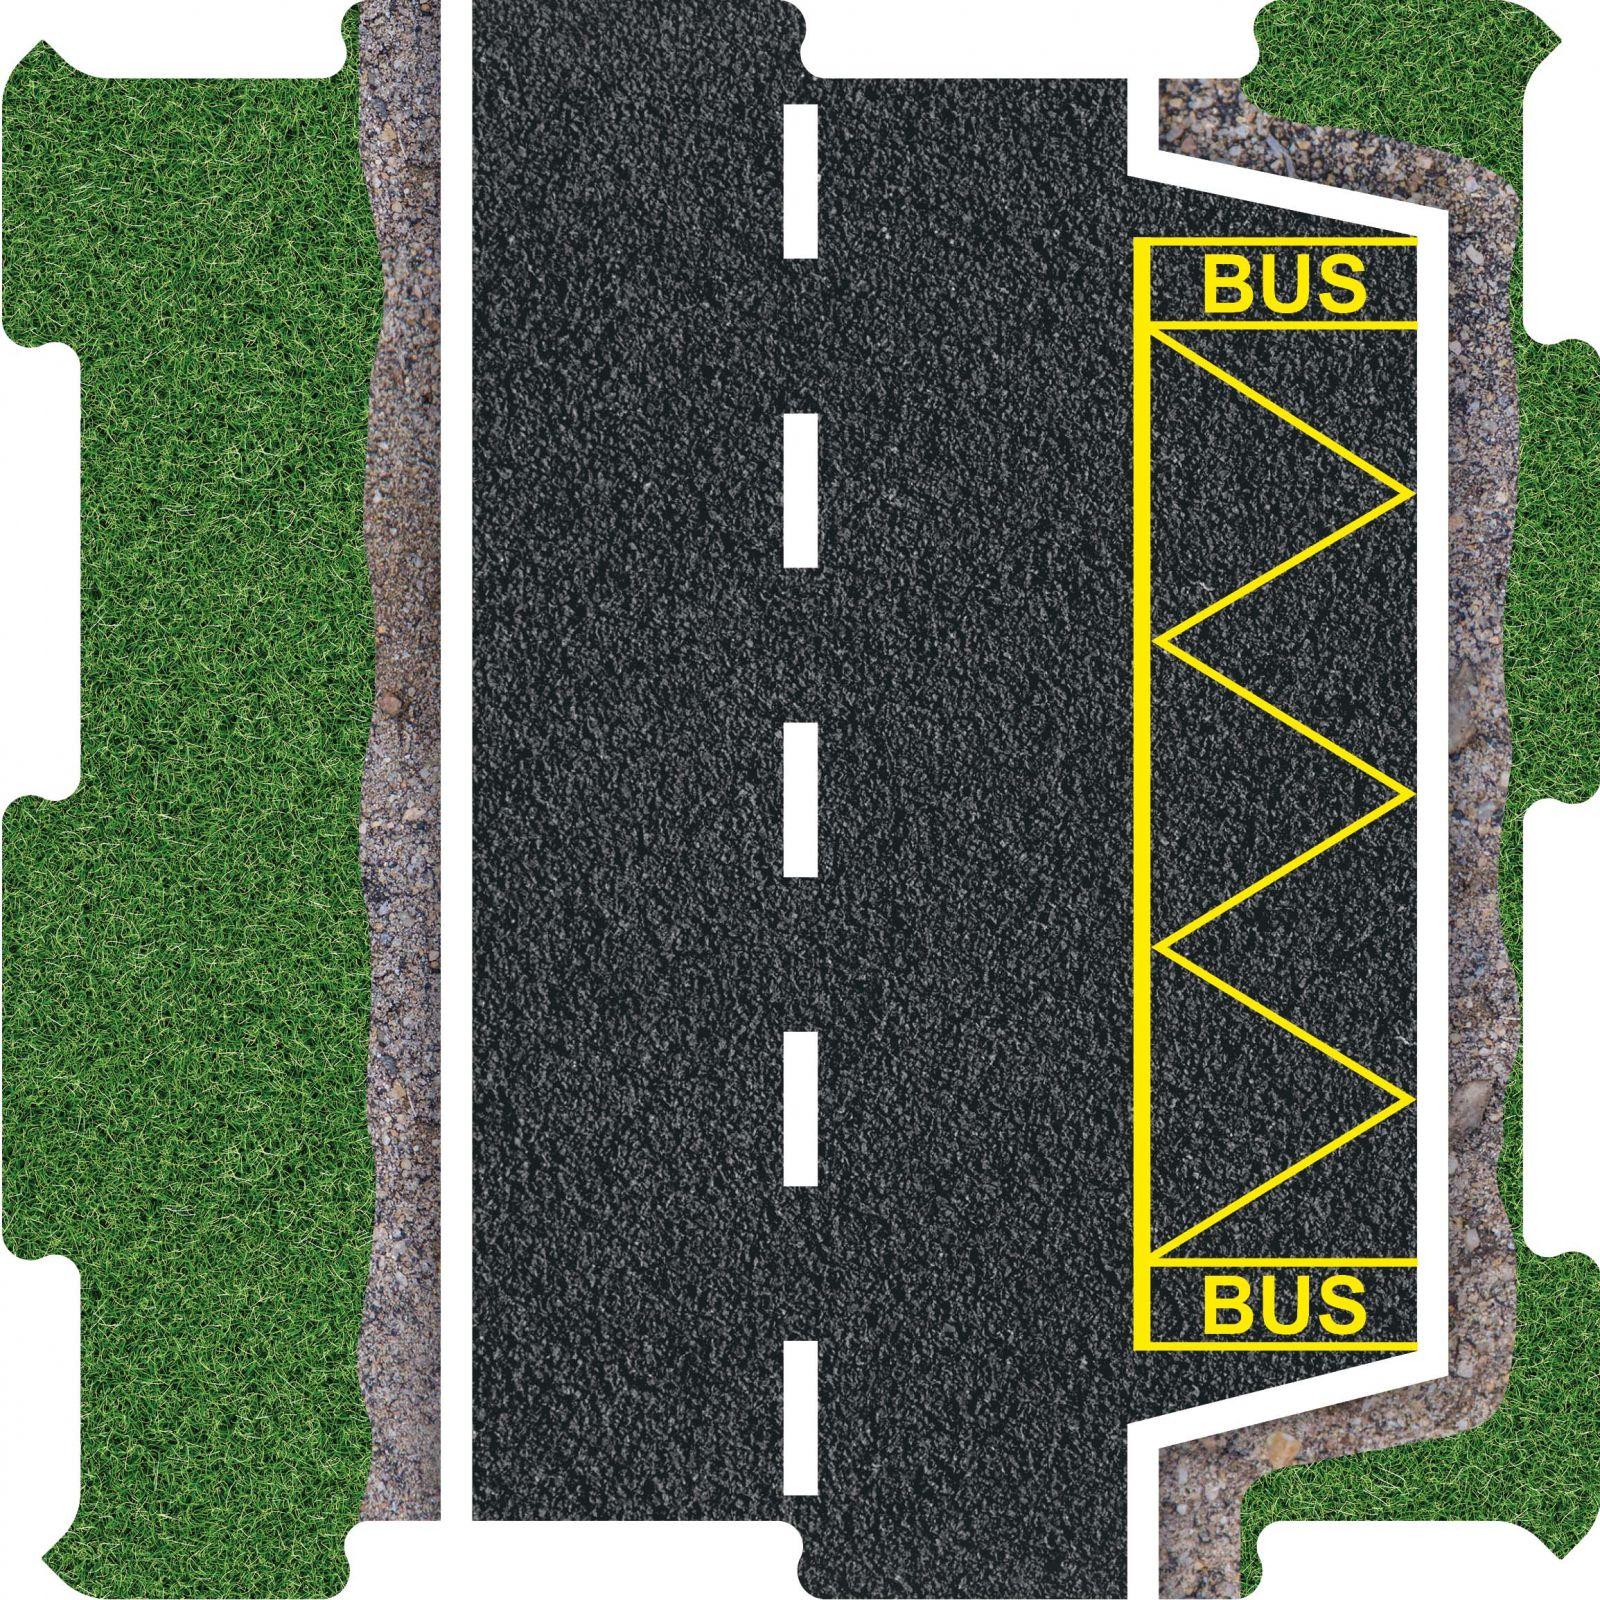 Podlahove puzzle silnice zastavka BUS